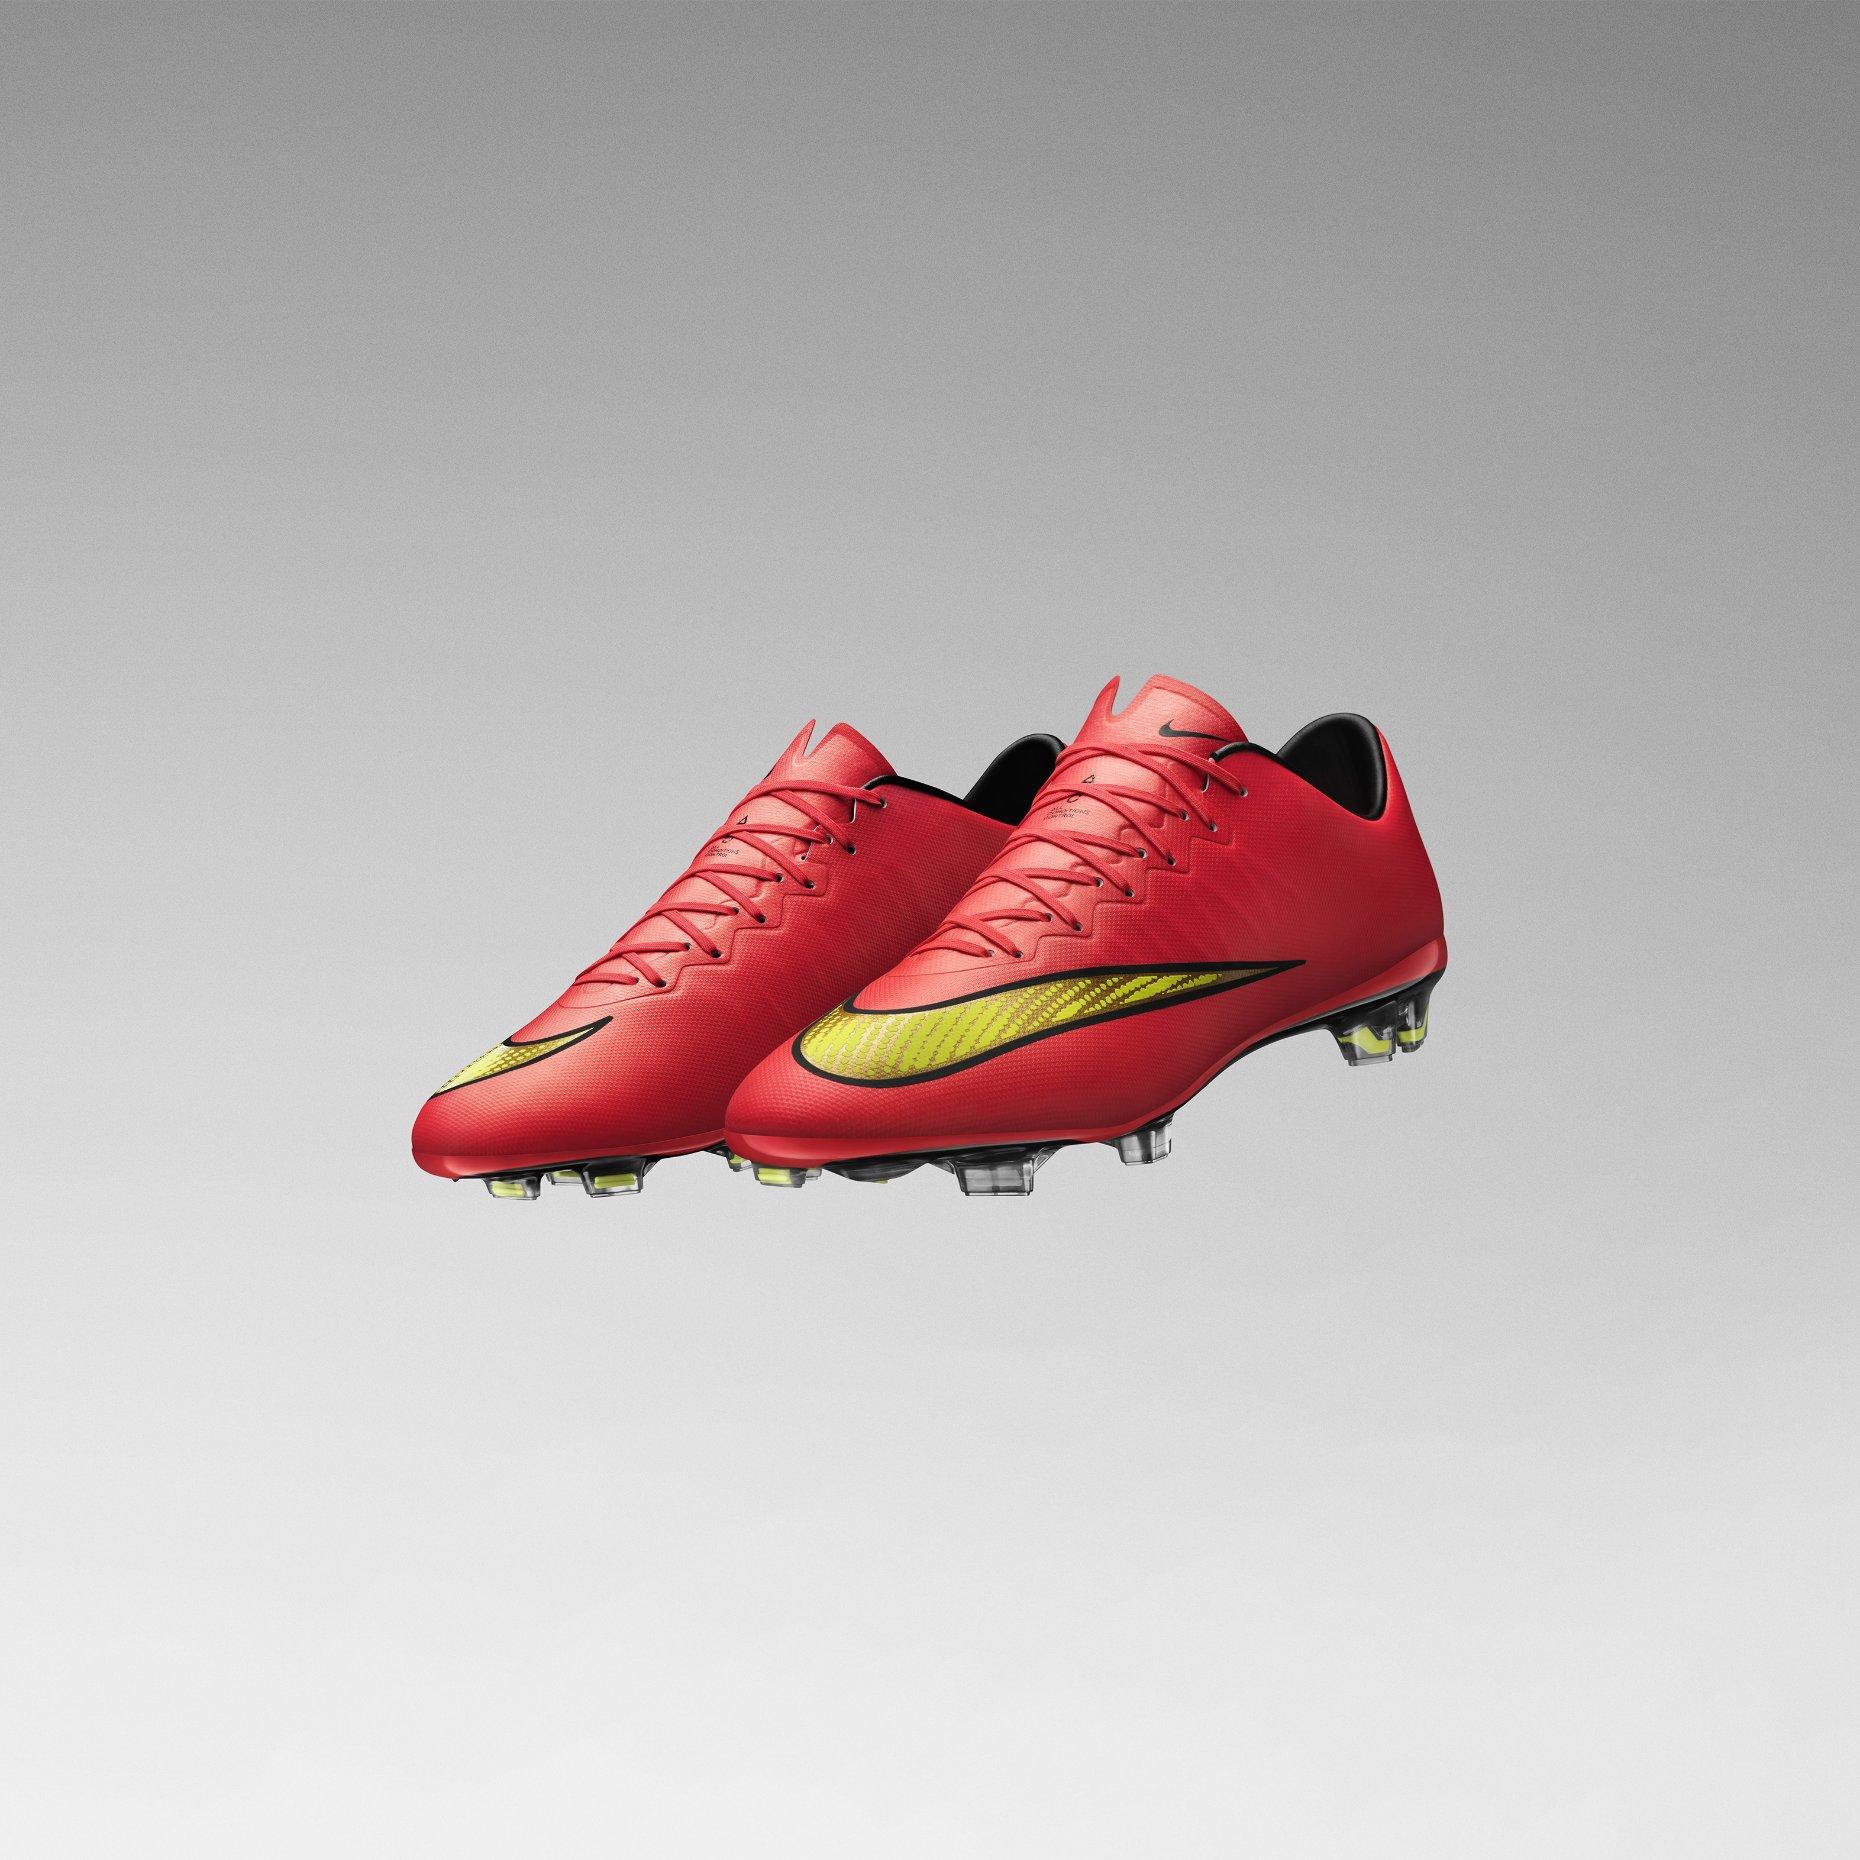 newest fbc3d 585c6 Nike Mercurial Vapor X FG - Hyper Punch / Gold / Black | Football ...